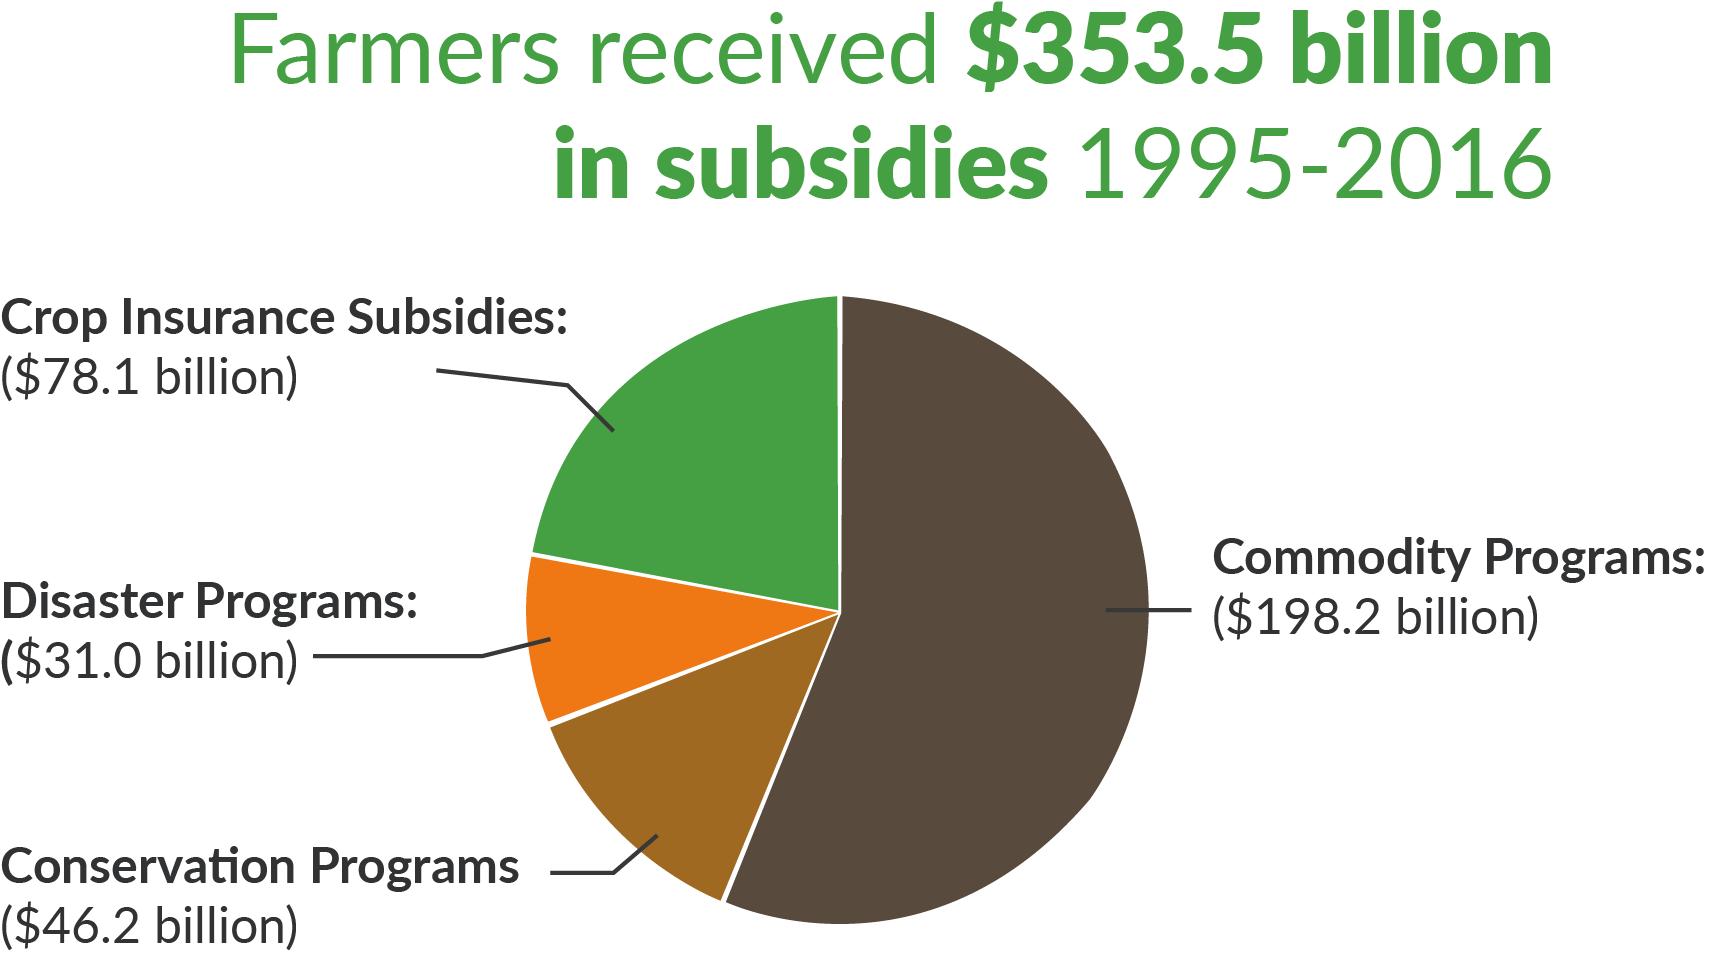 How to Get a Farm Subsidy